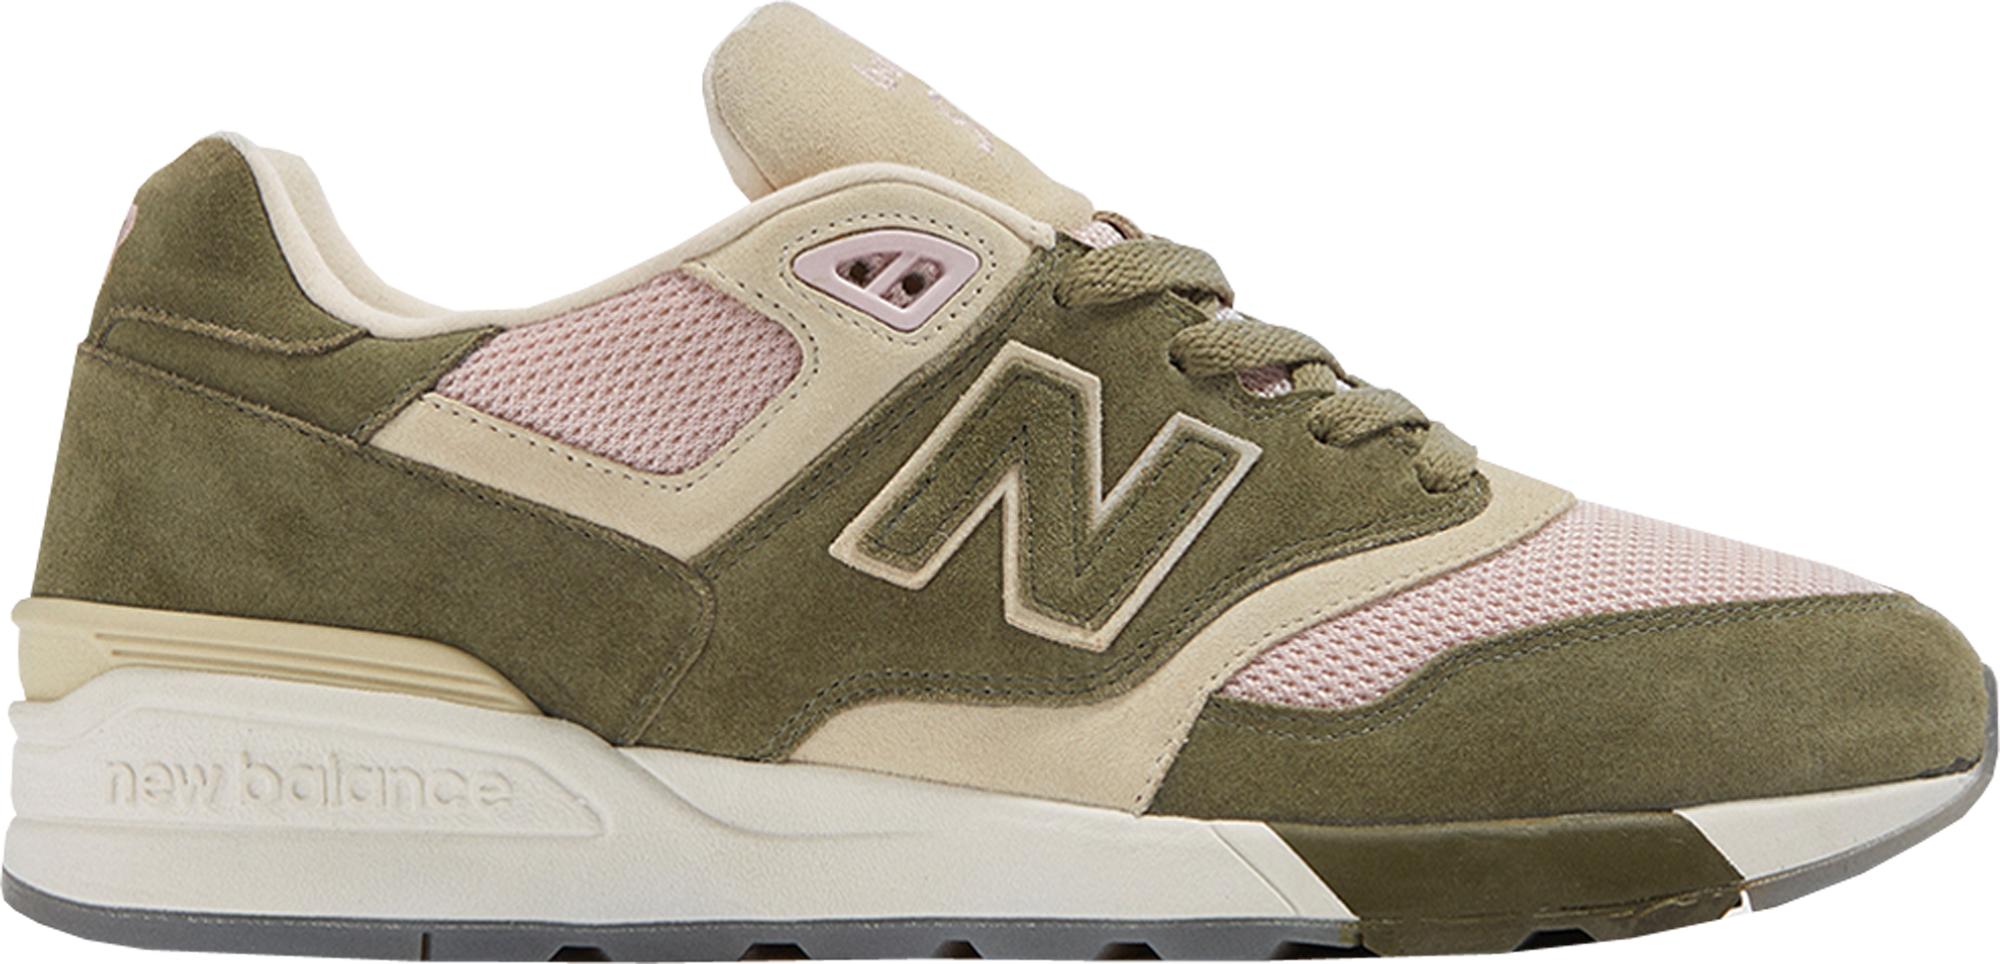 new balance 597 neotropic